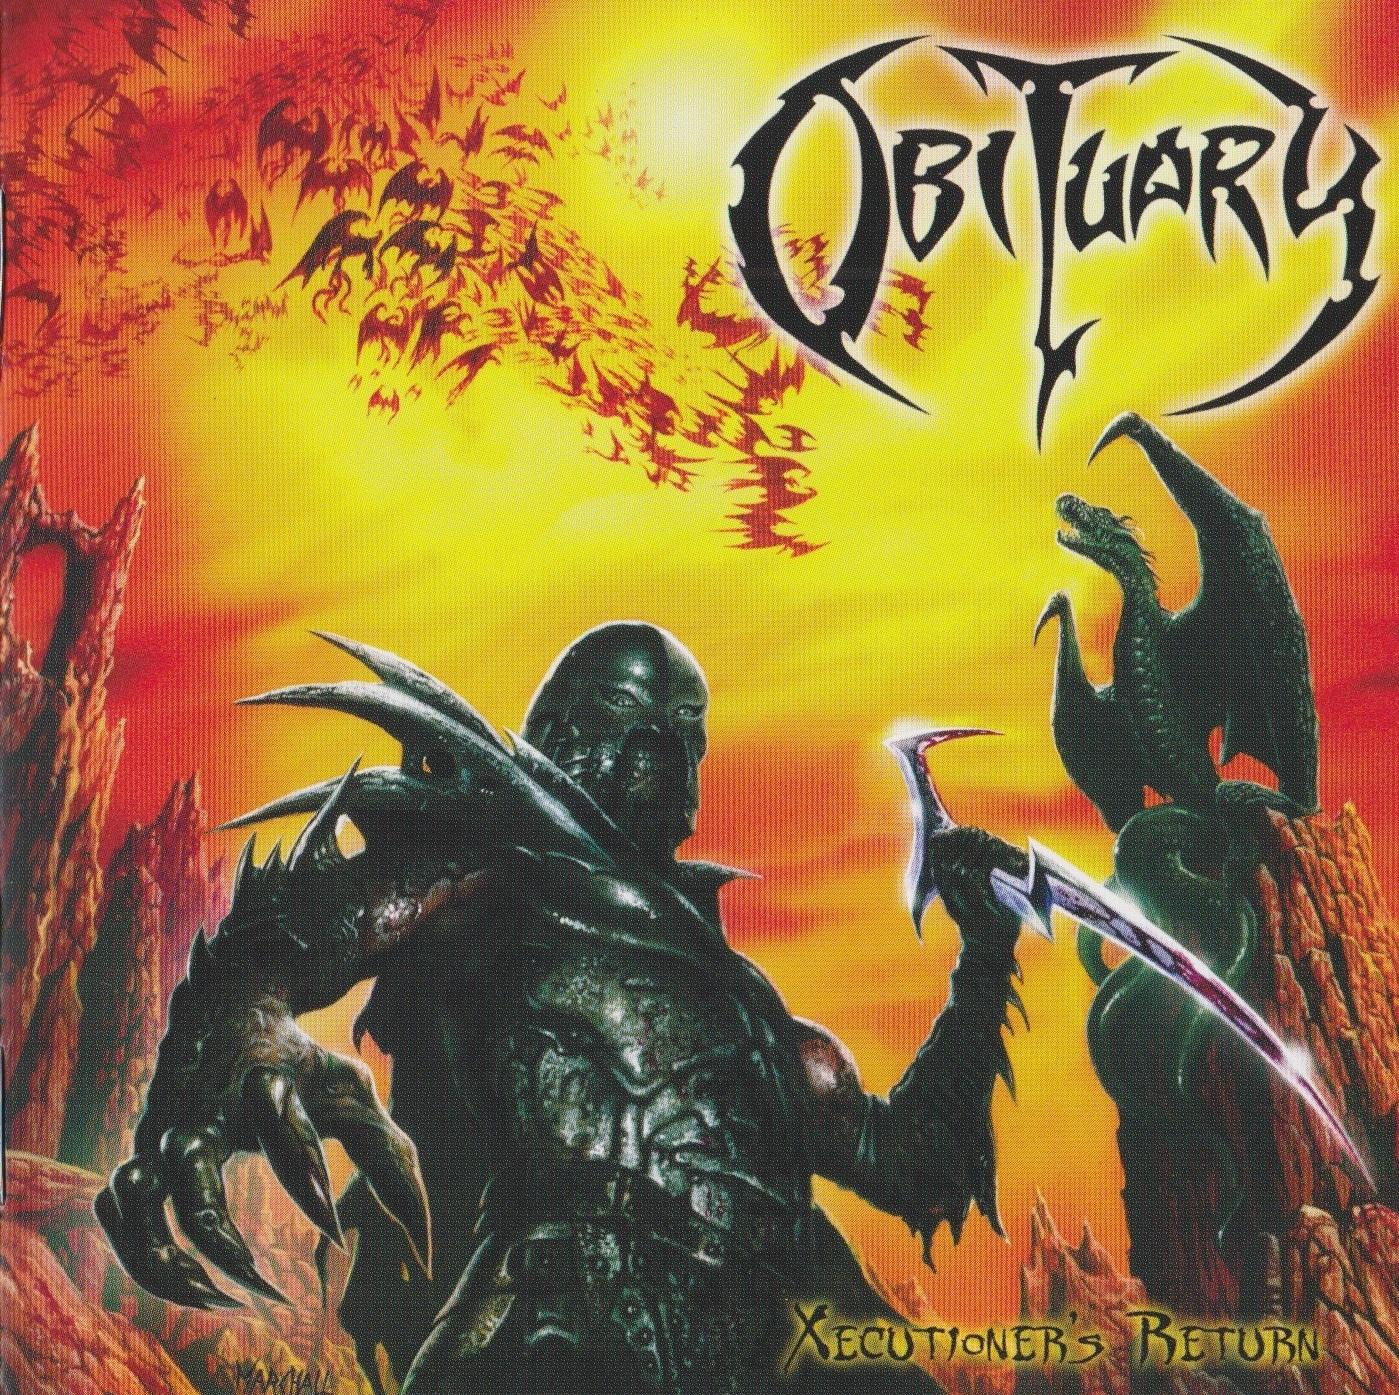 Obituary — Xecutioner's Return (2007)